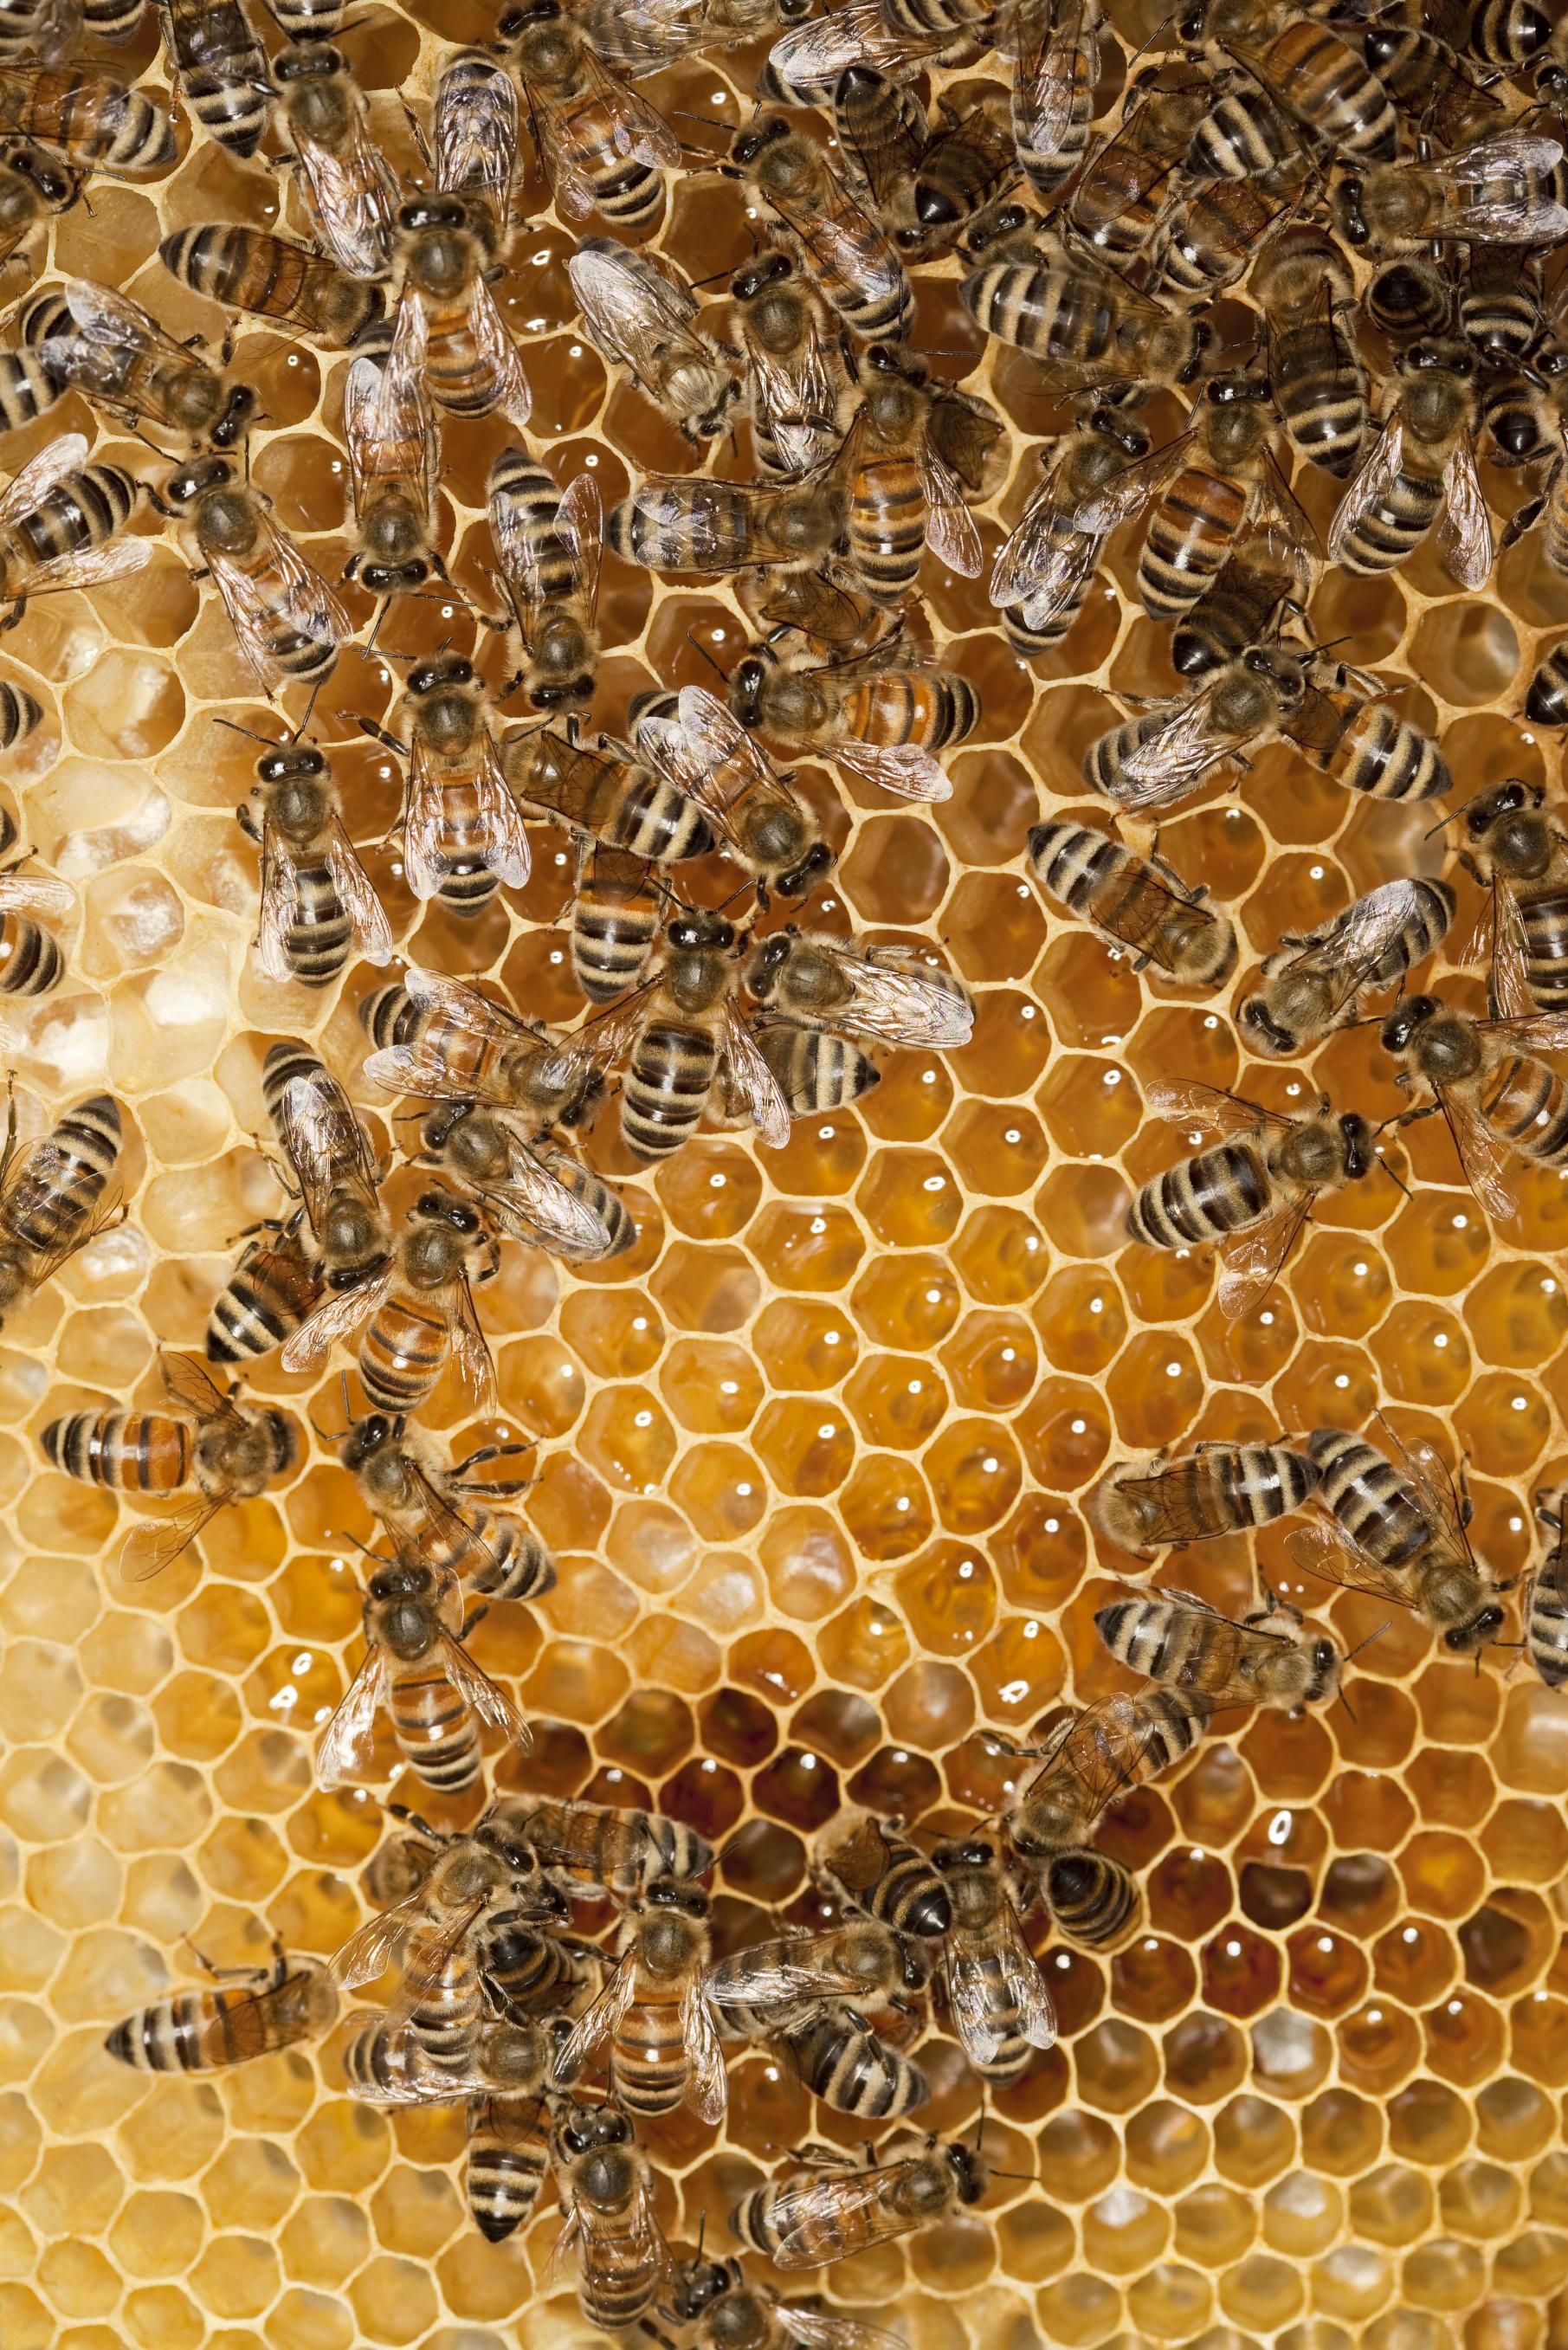 Bees on honeycomb 2.jpg